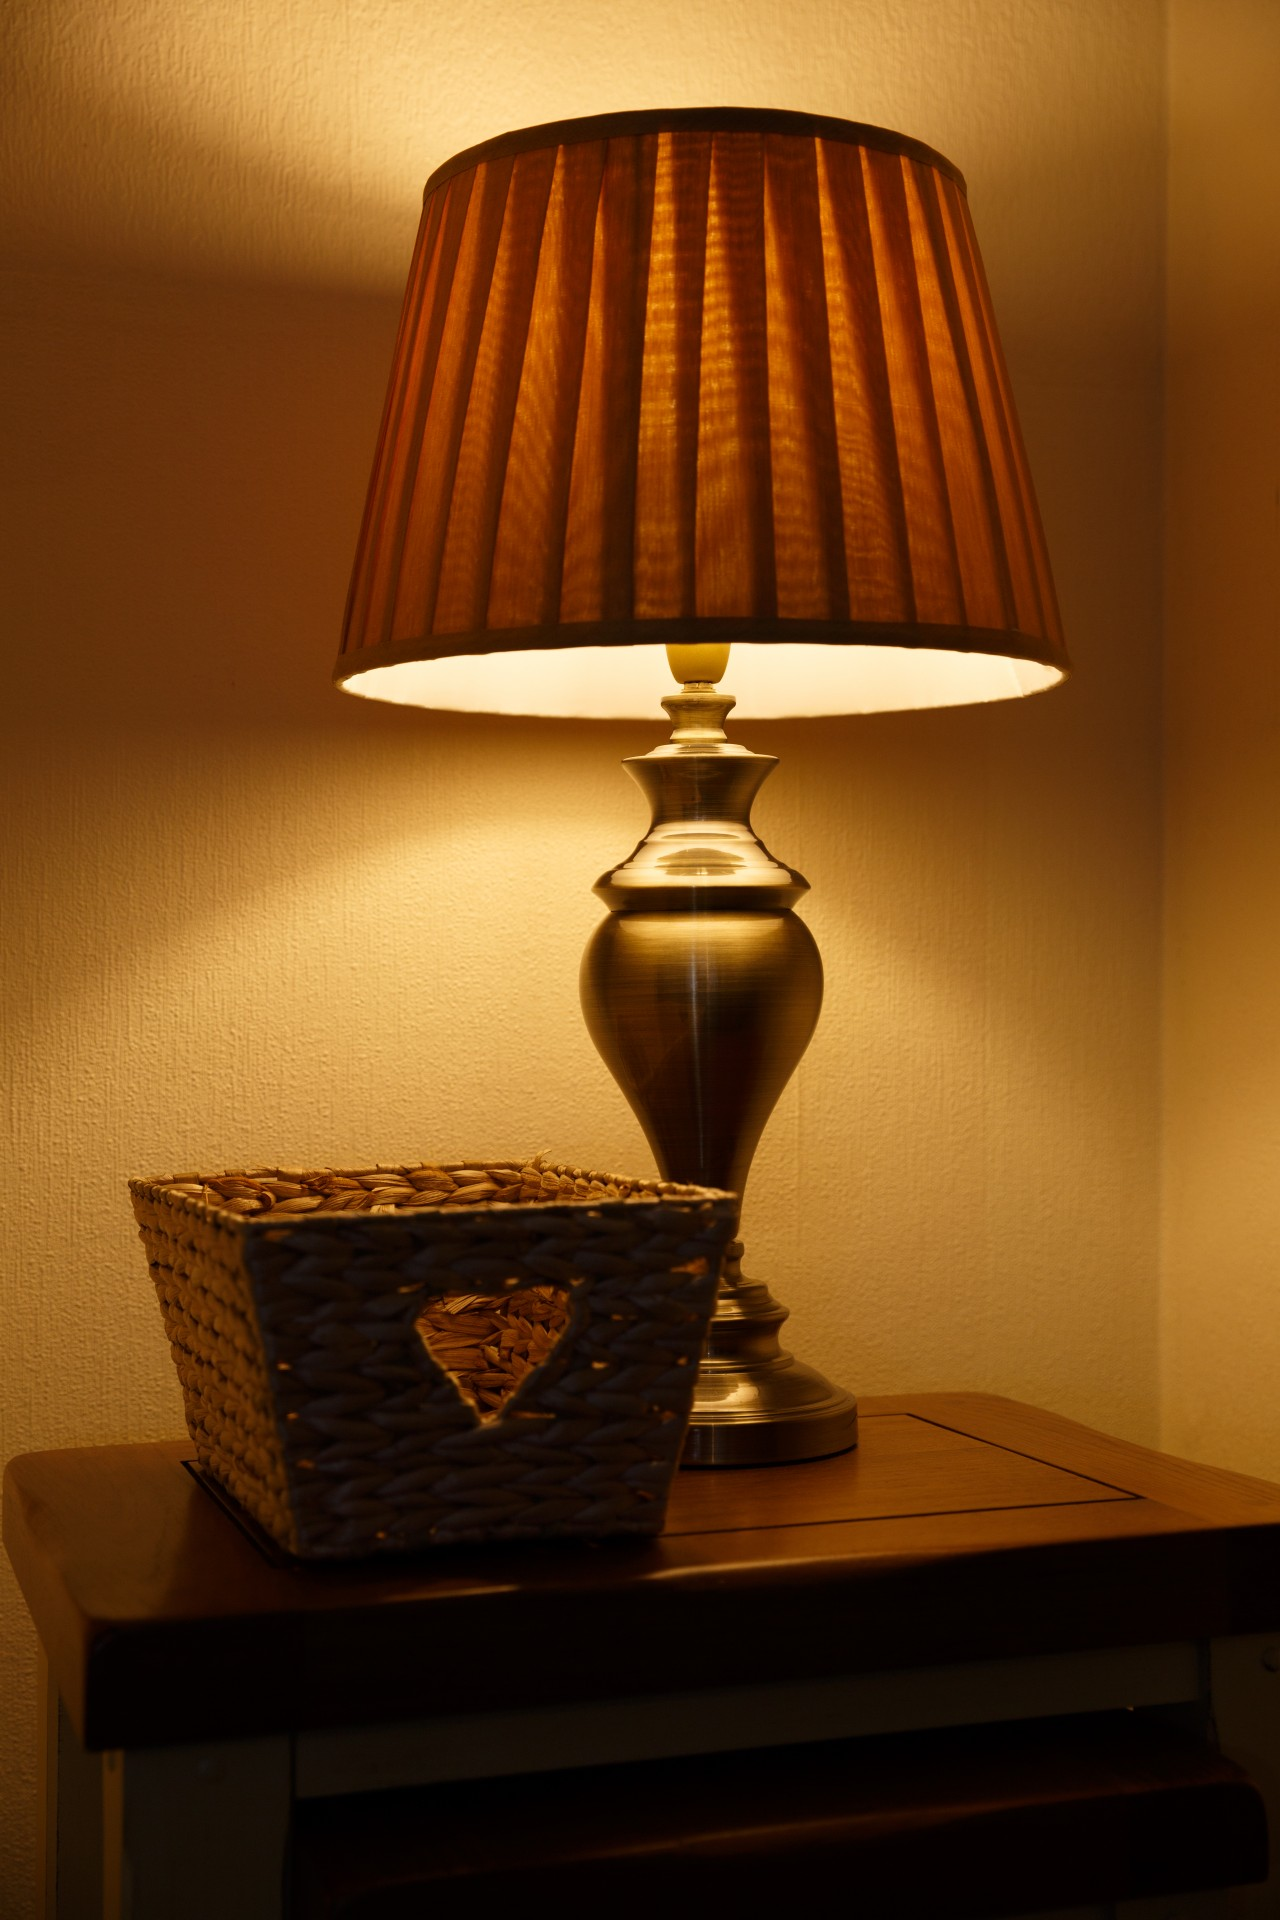 Lit Table Lamp Free Stock Photo Public Domain Pictures